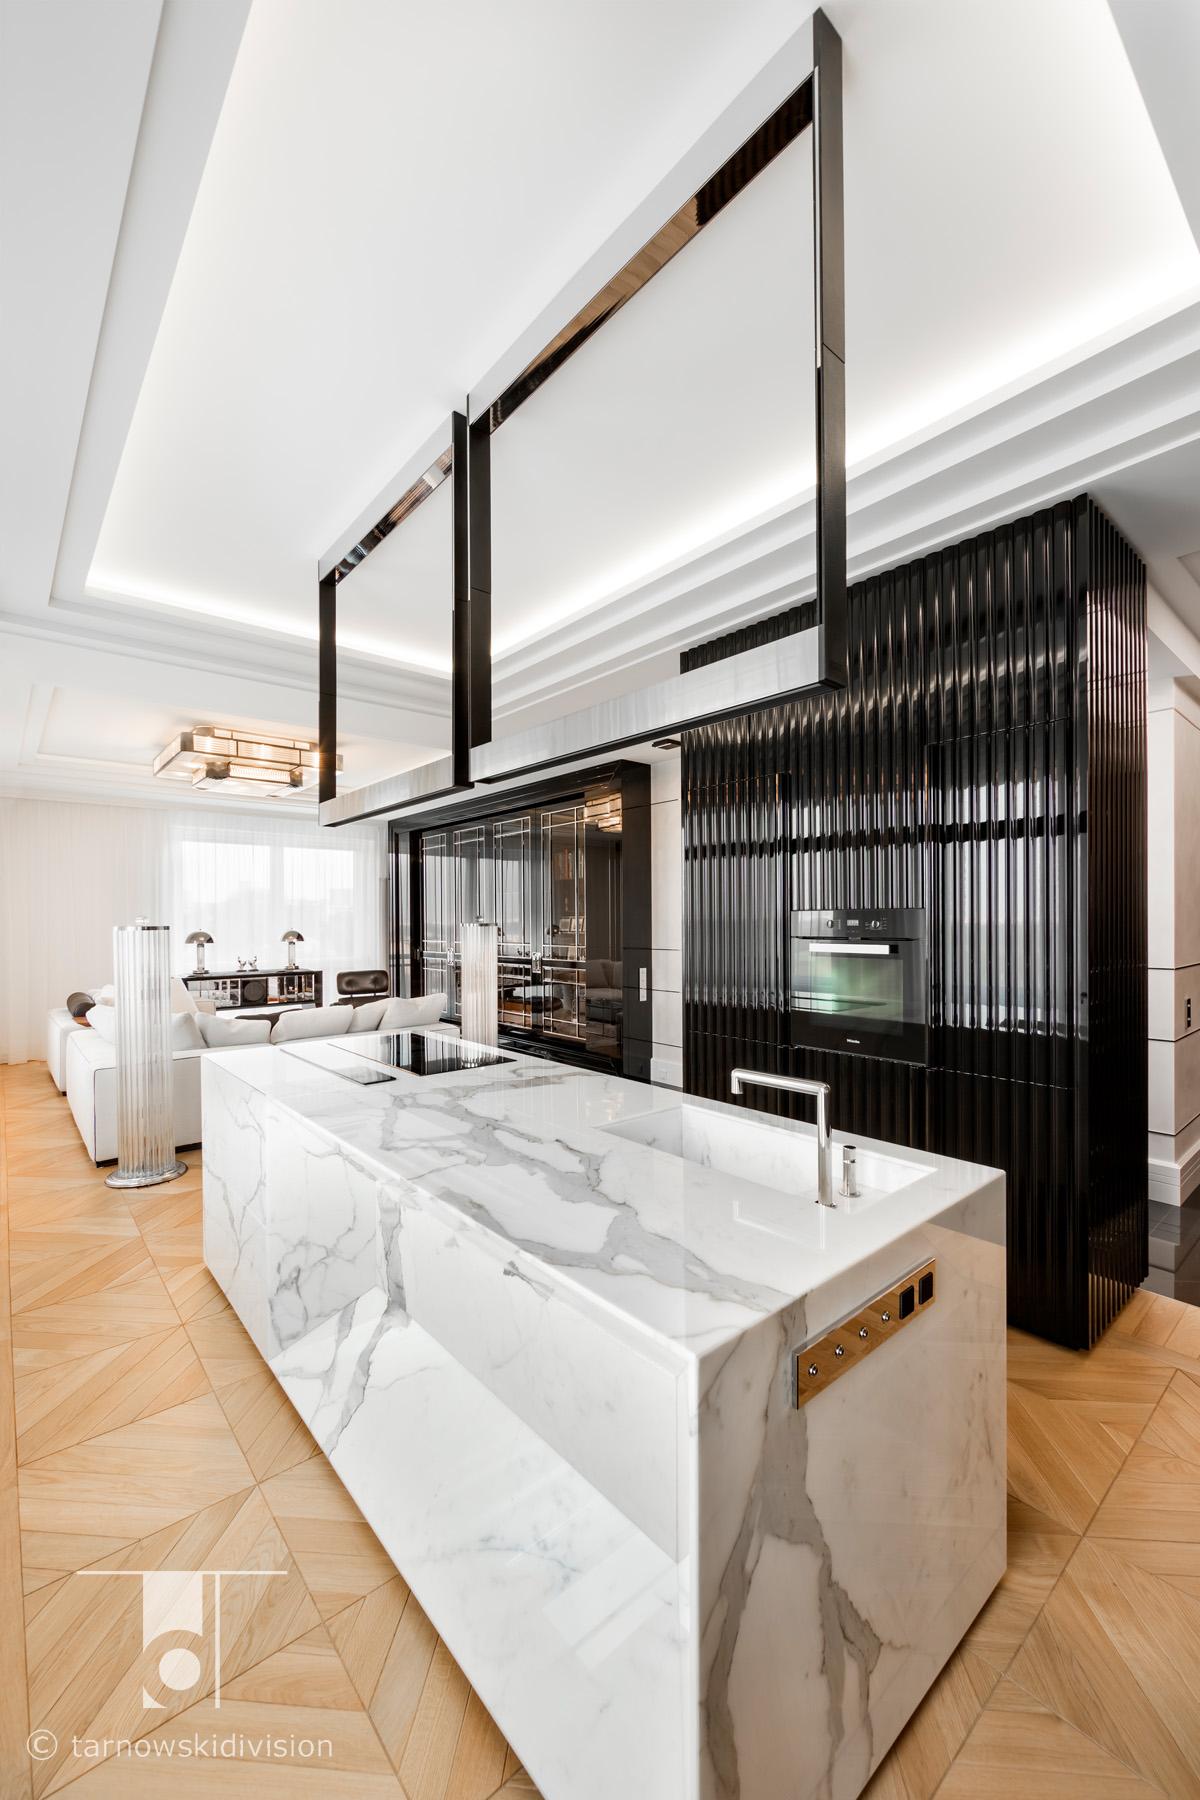 ekskluzywna kuchnia luksusowa kamienna wyspa kuchenna z kamienia aranżacja kuchni marble kitchen island design_tarnowski division